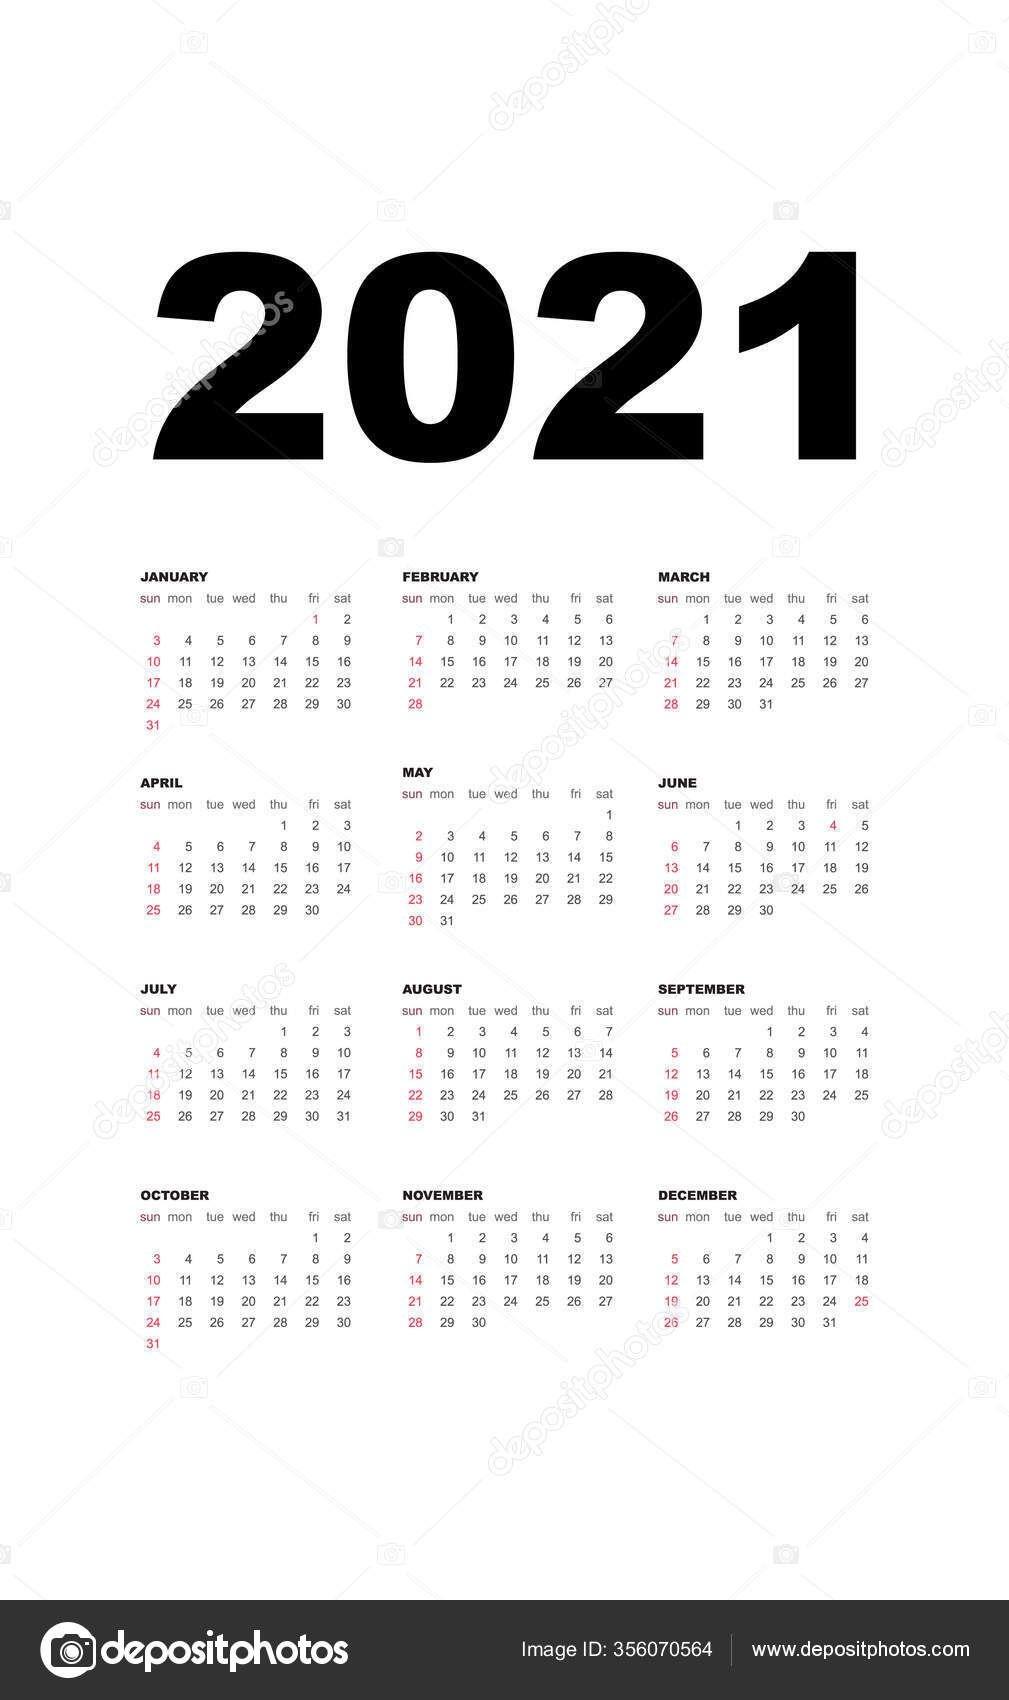 Календарь 2021 Шаблон Календаря Дизайн Черно Белых Цветах